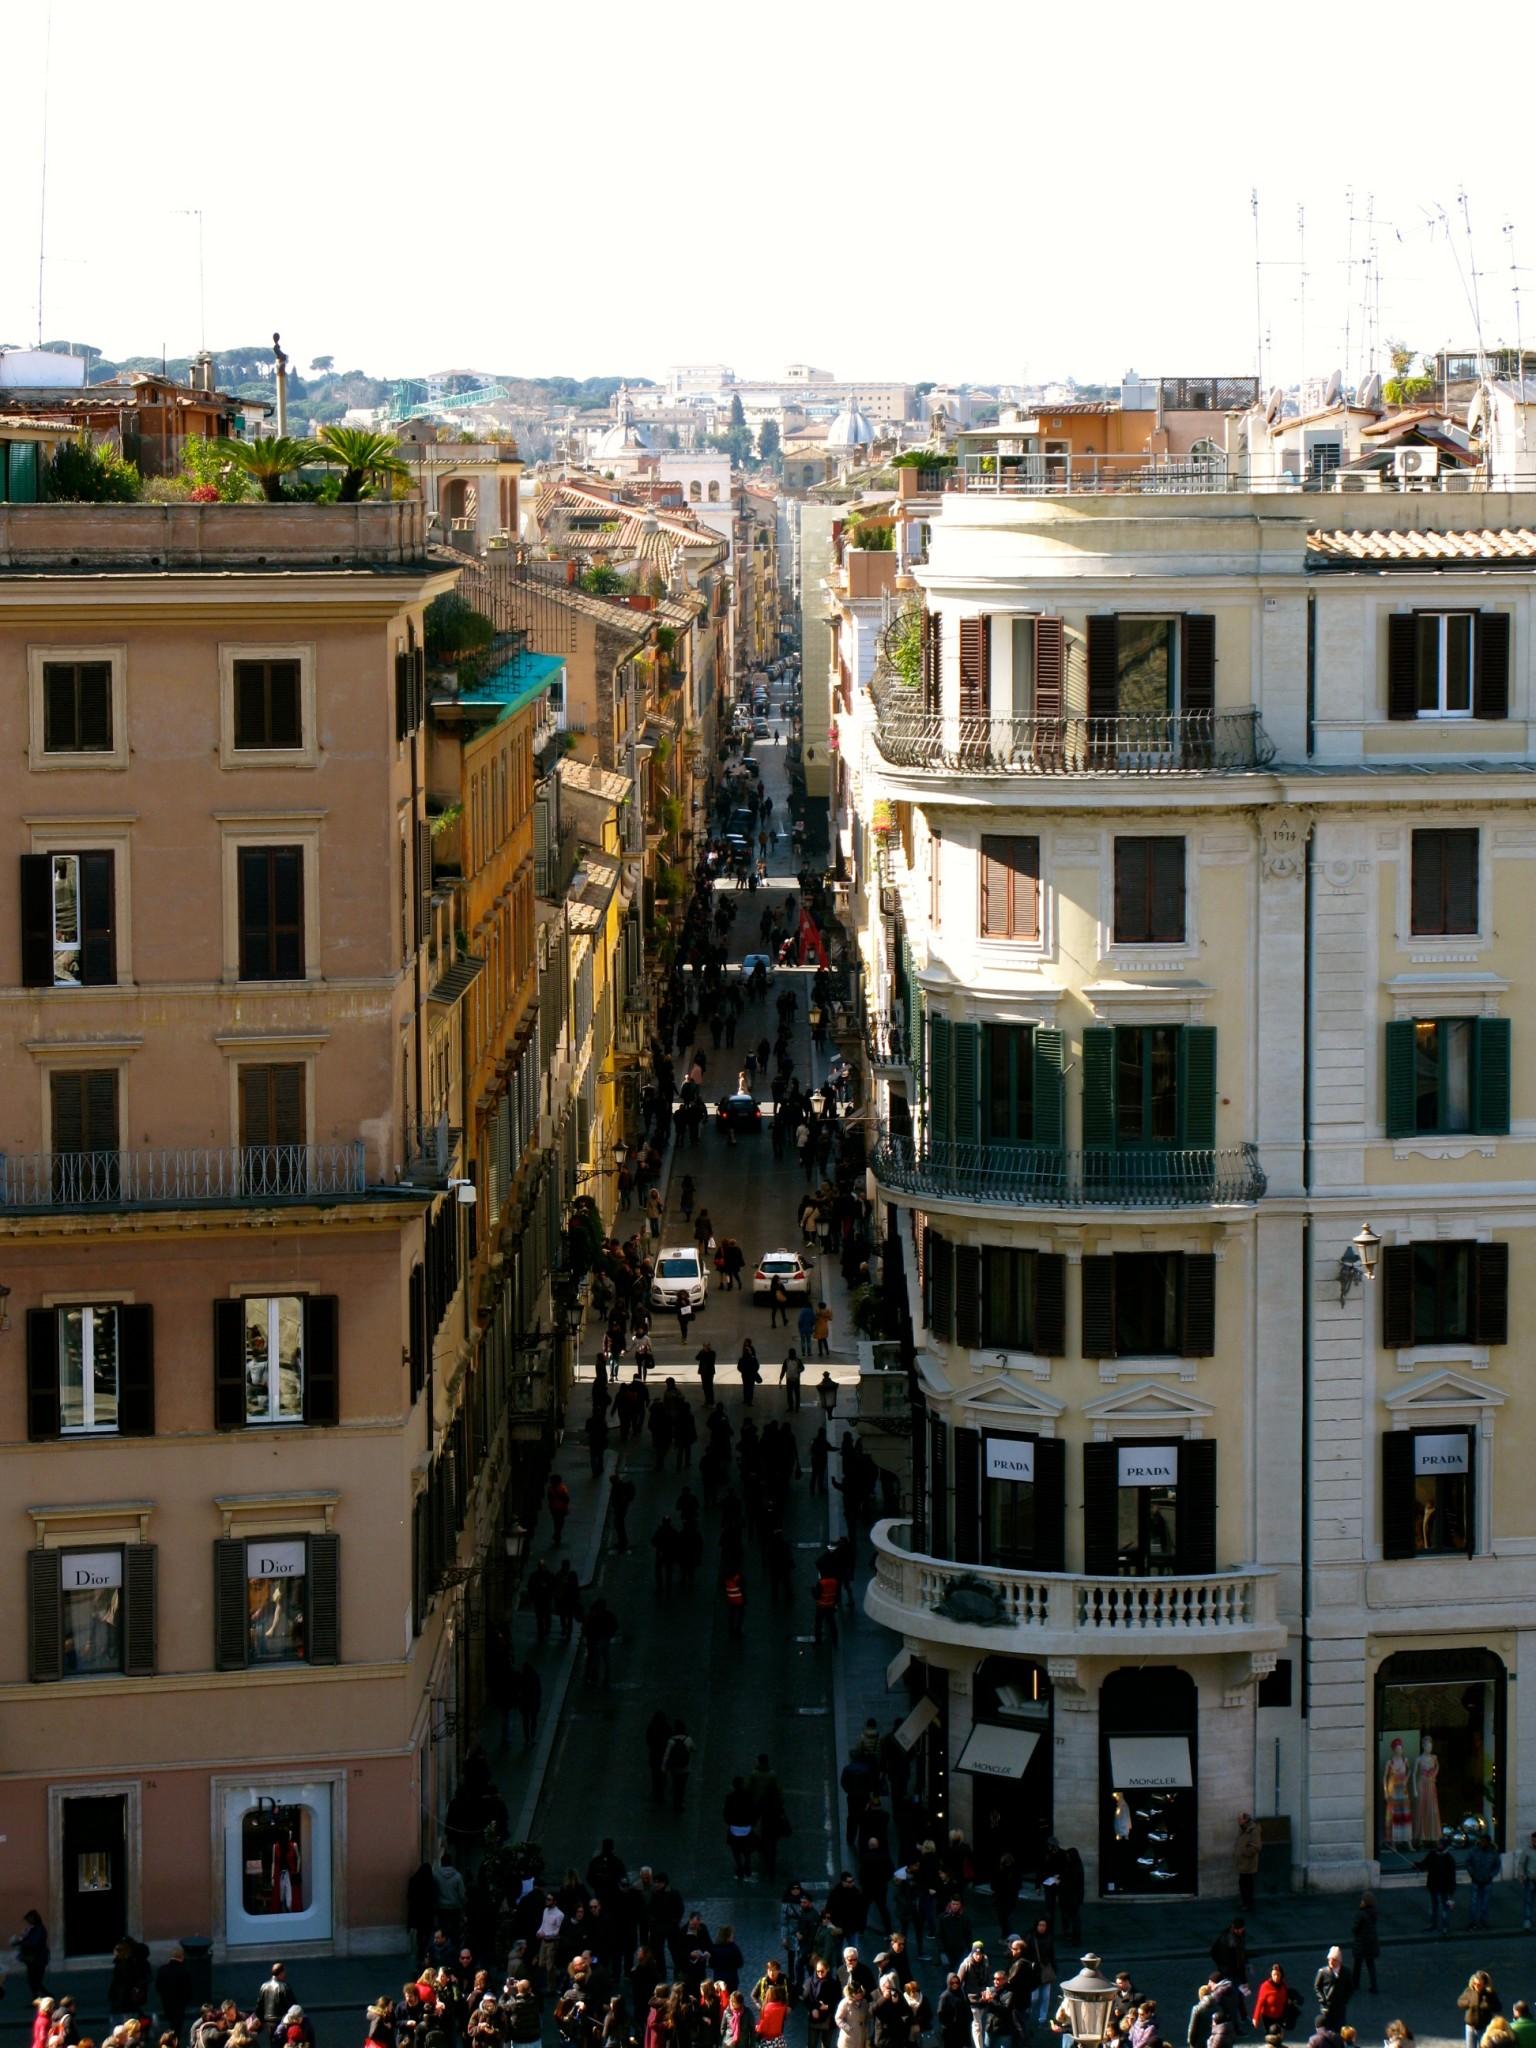 Espanjalaiset portaat